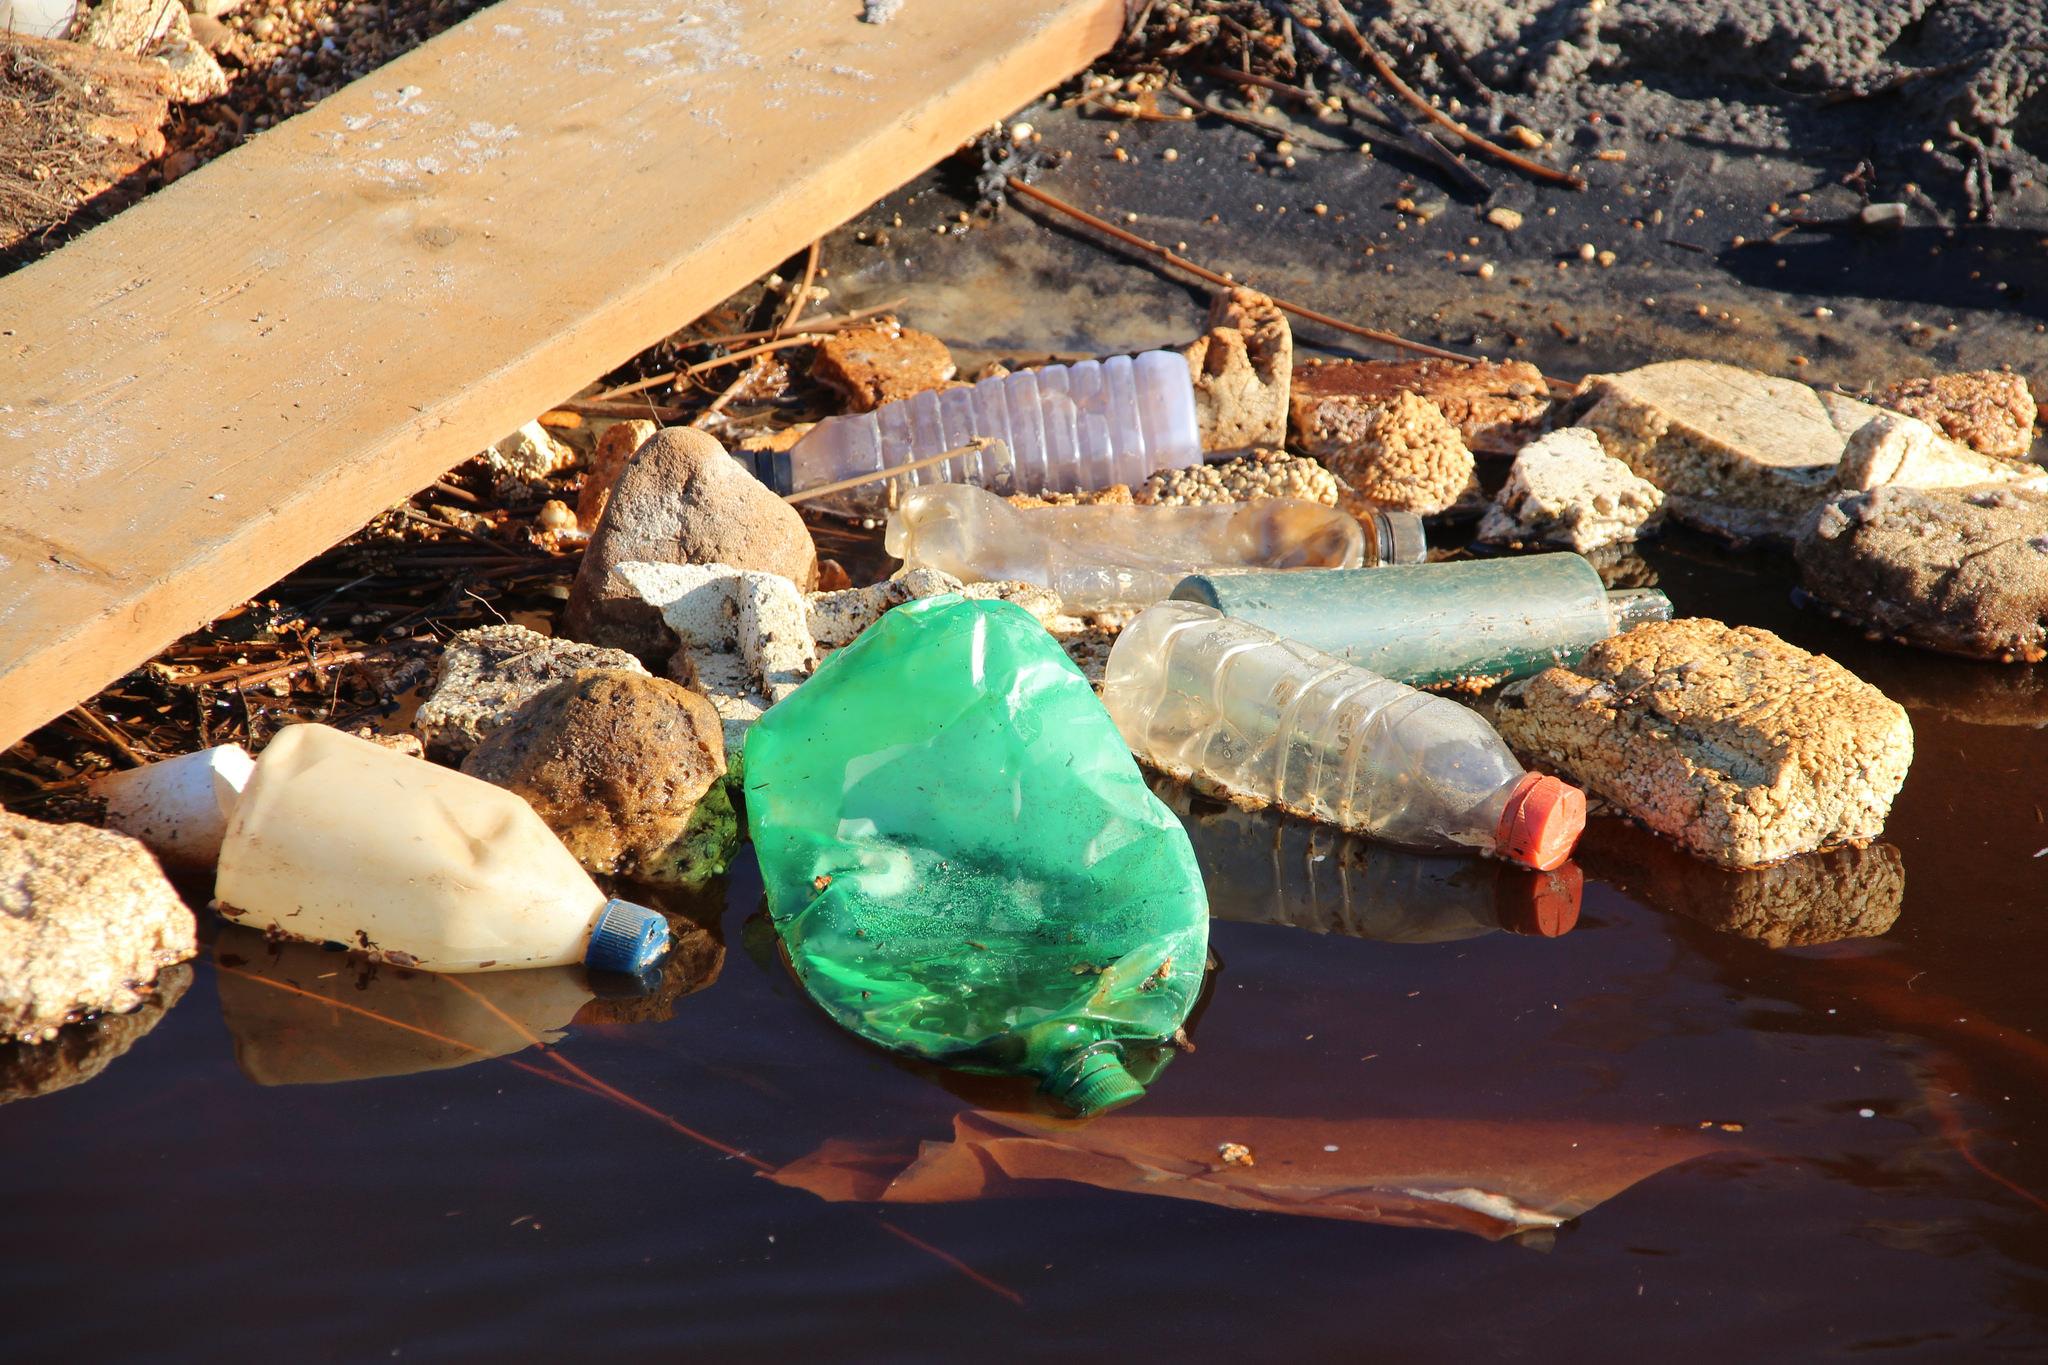 Minimer dit plastikforbrug og skån miljøet